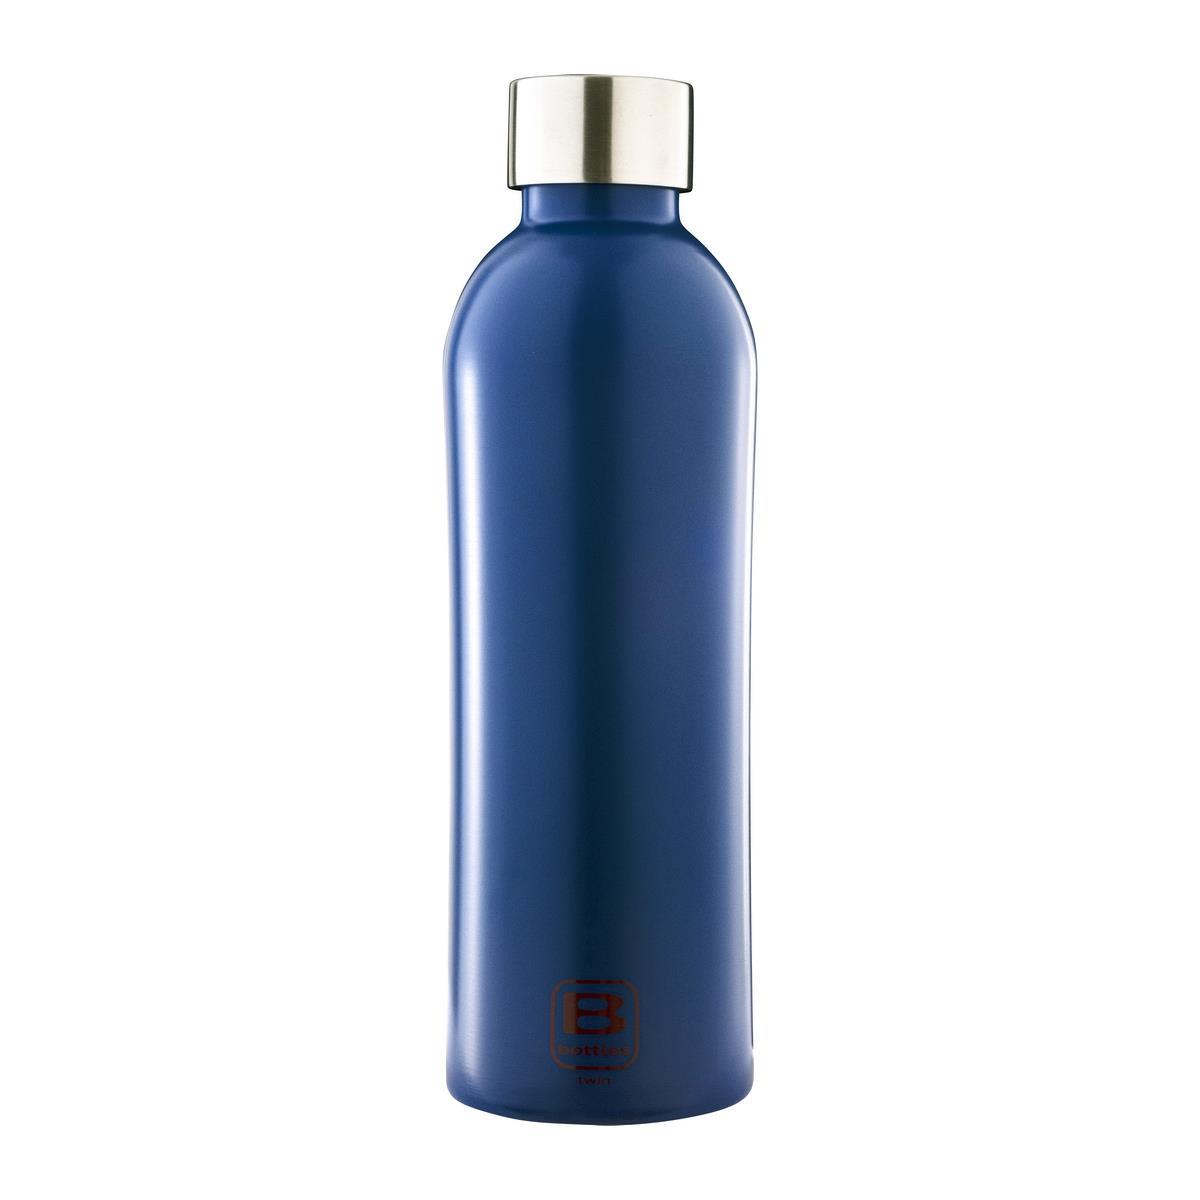 B Bottles Twin - Classic Blue - 800 ml - Bottiglia Termica a doppia parete in acciaio inox 18/10